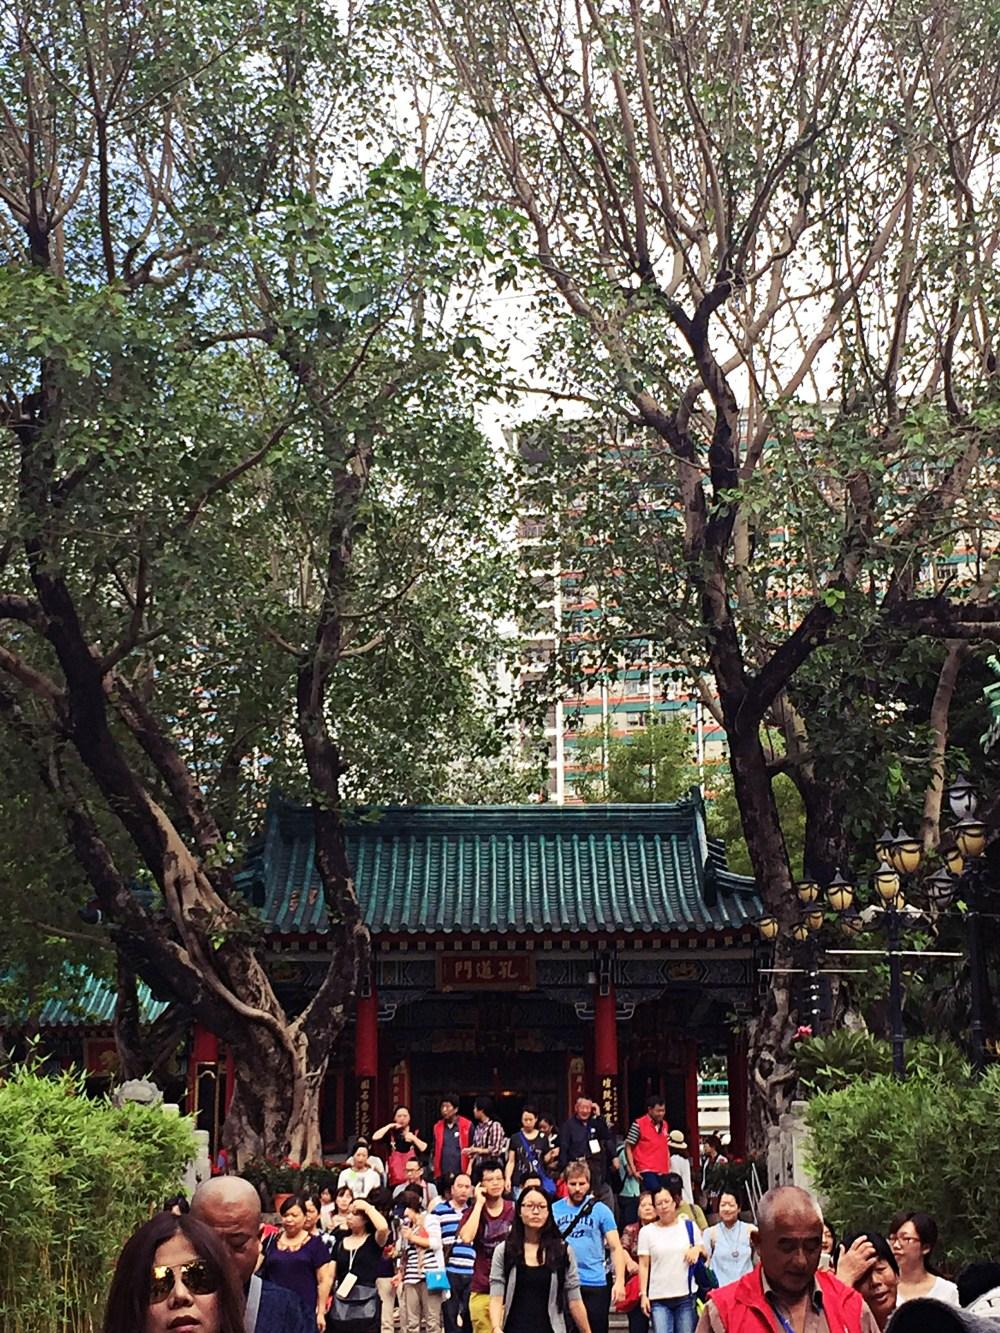 7 Nov 2015: Wong Tai Sin Temple | Chuk Un, Hong Kong